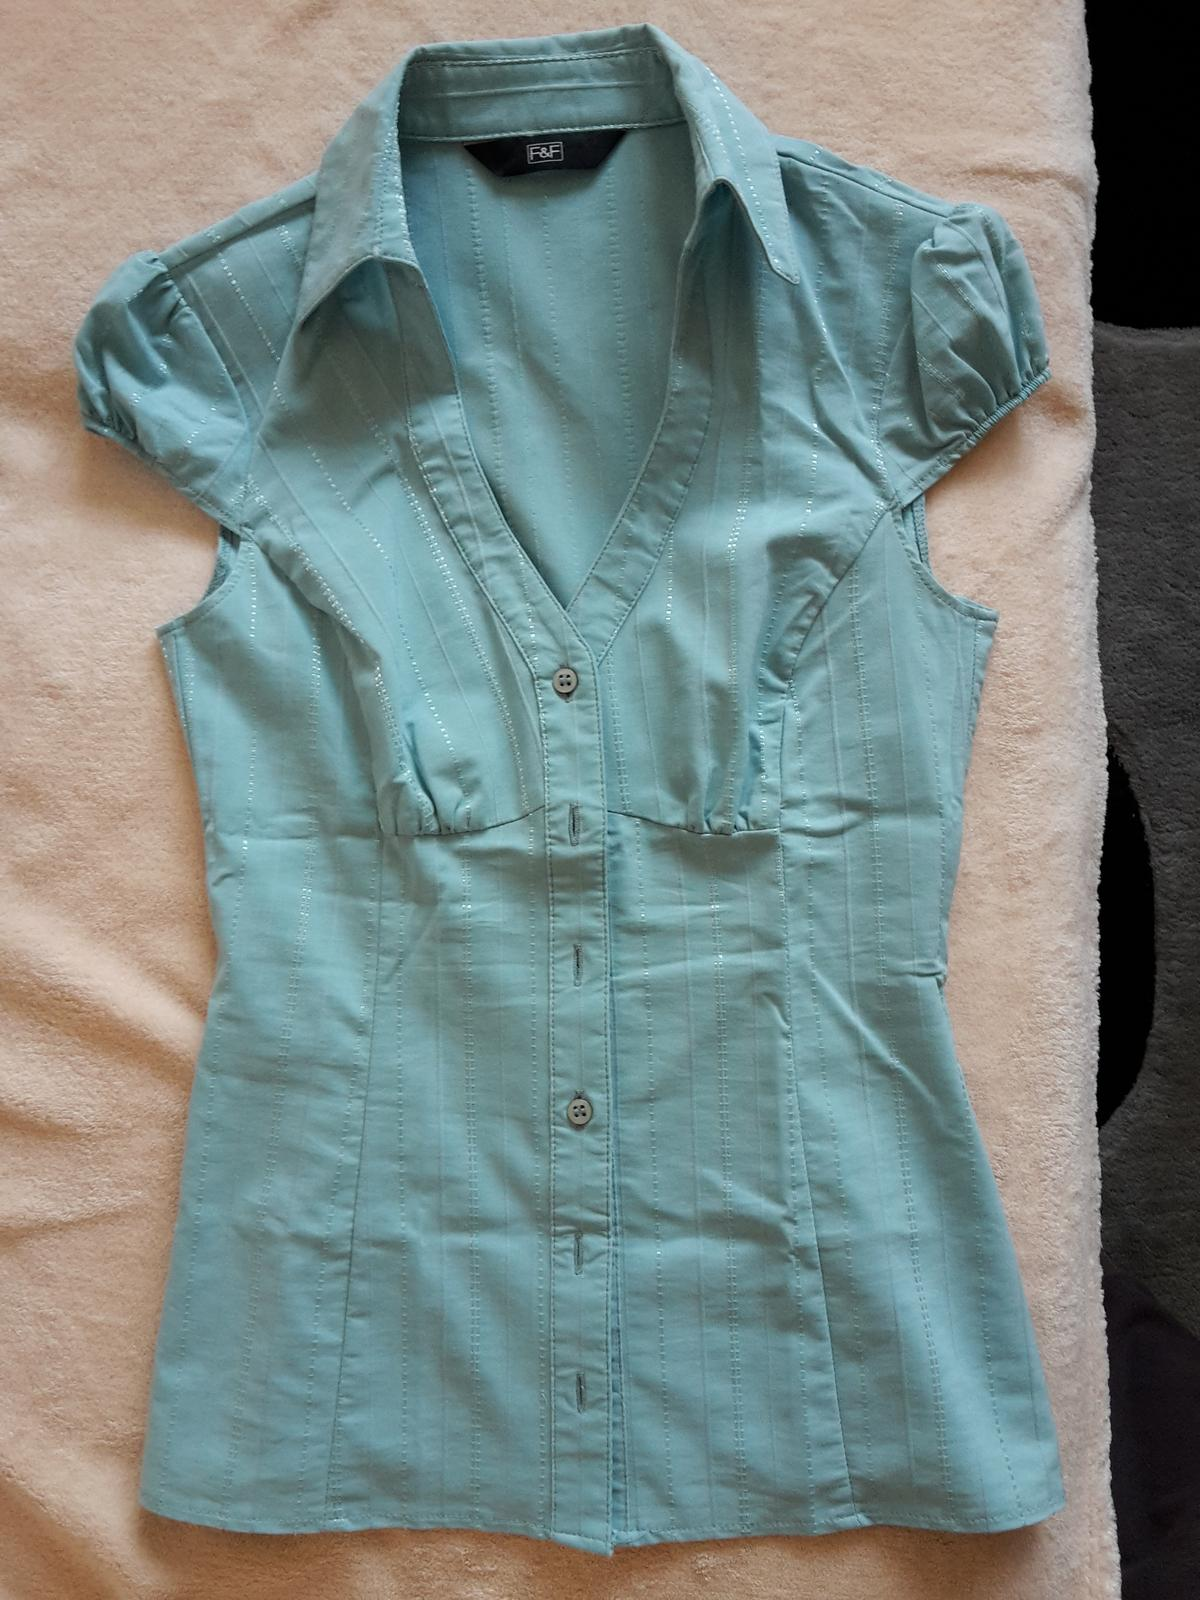 nenosena bluzocka - Obrázok č. 1